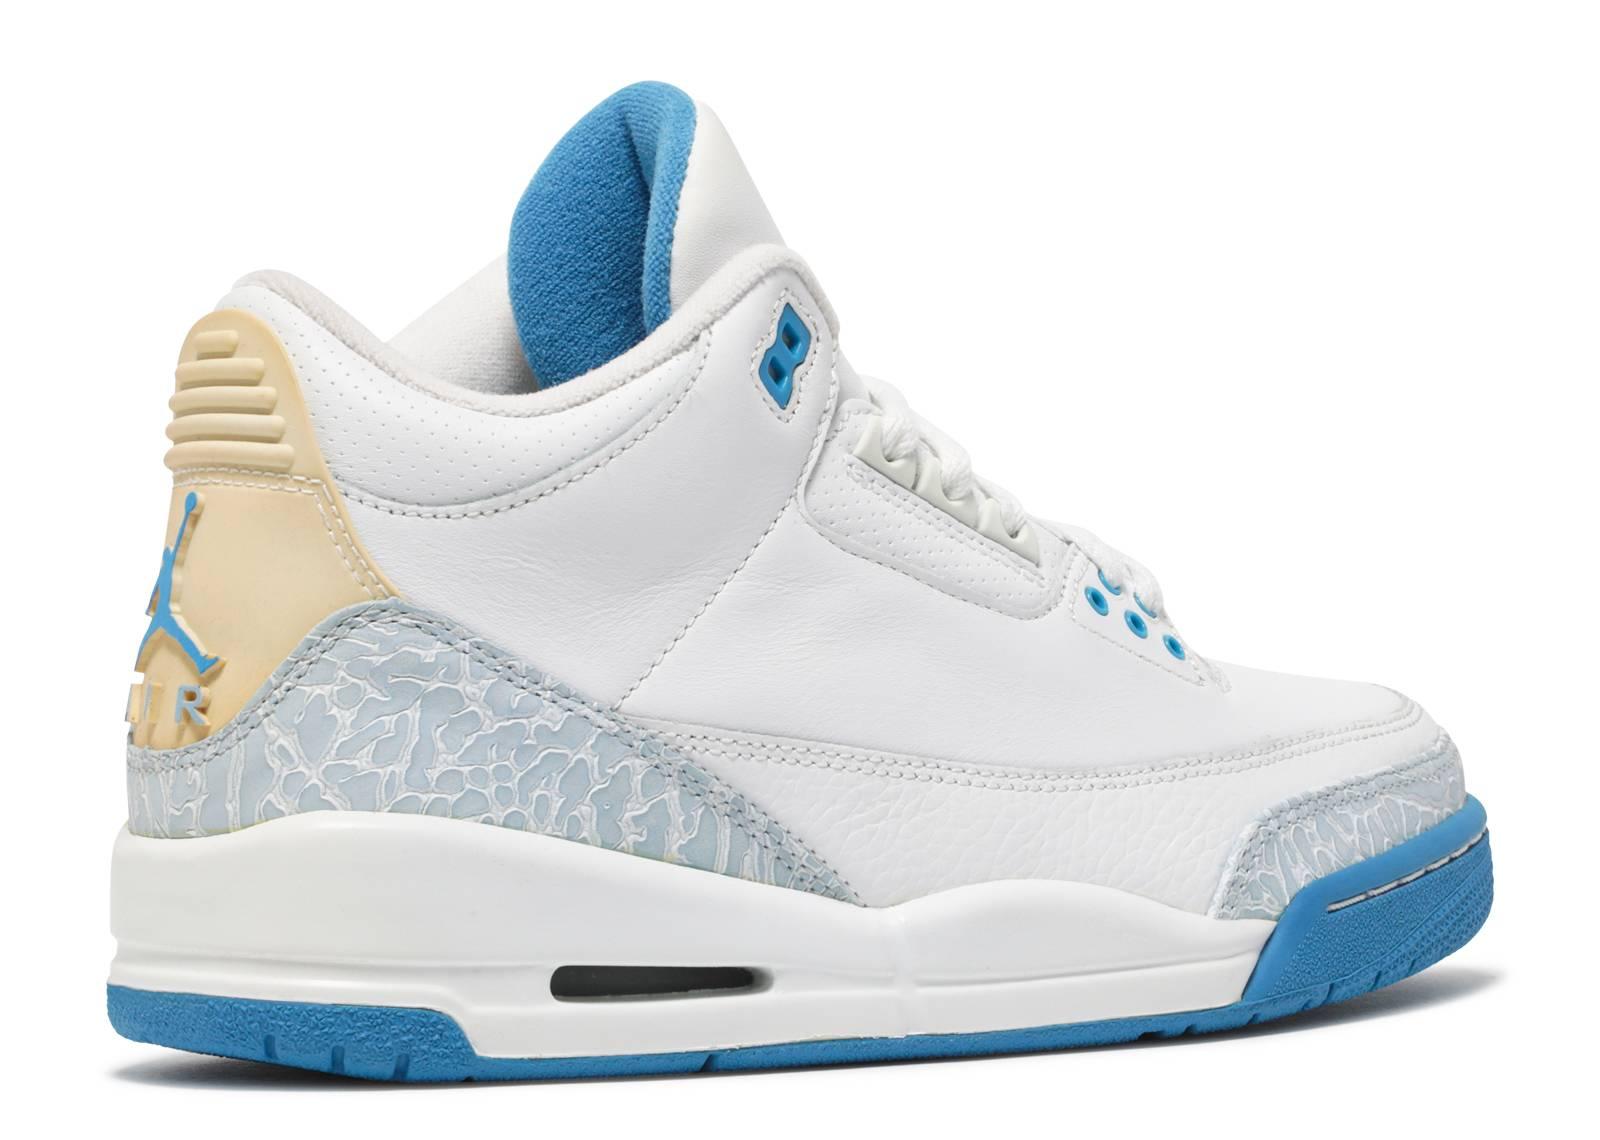 Womens Air Jordan 3 Retro - Air Jordan - 315296 142 - white harbor ... a649772f89